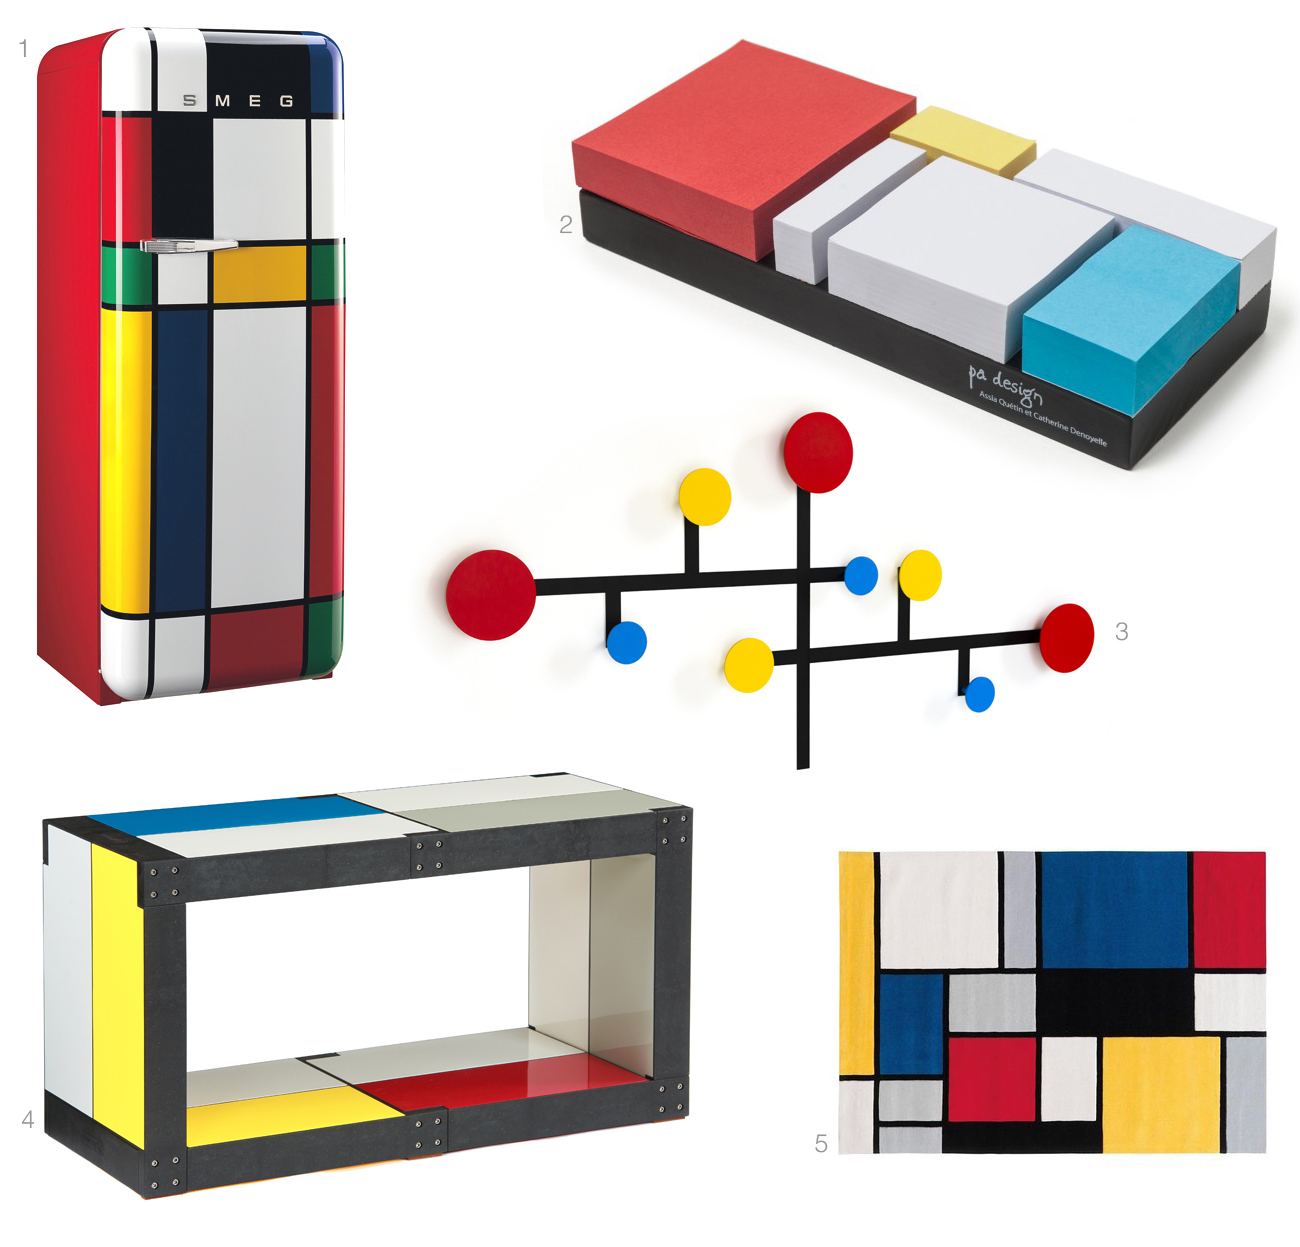 mondrian-art-inspired-surrealisme-furniture-interior-design-decoration-deco-decor